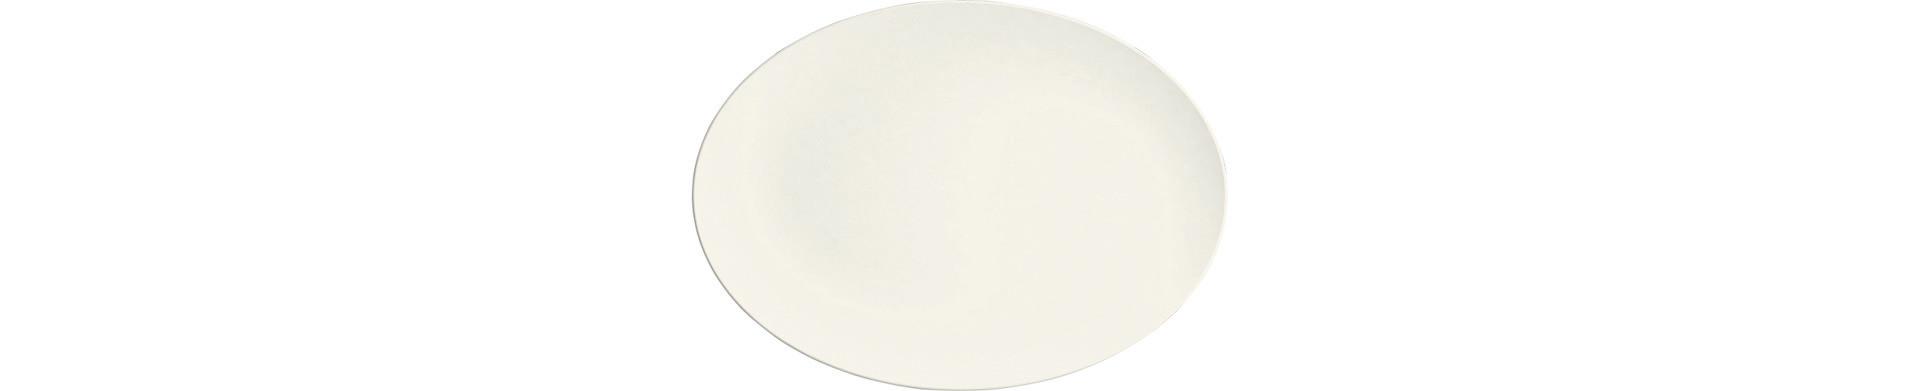 Purity, Coupplatte oval 118 x 88 mm